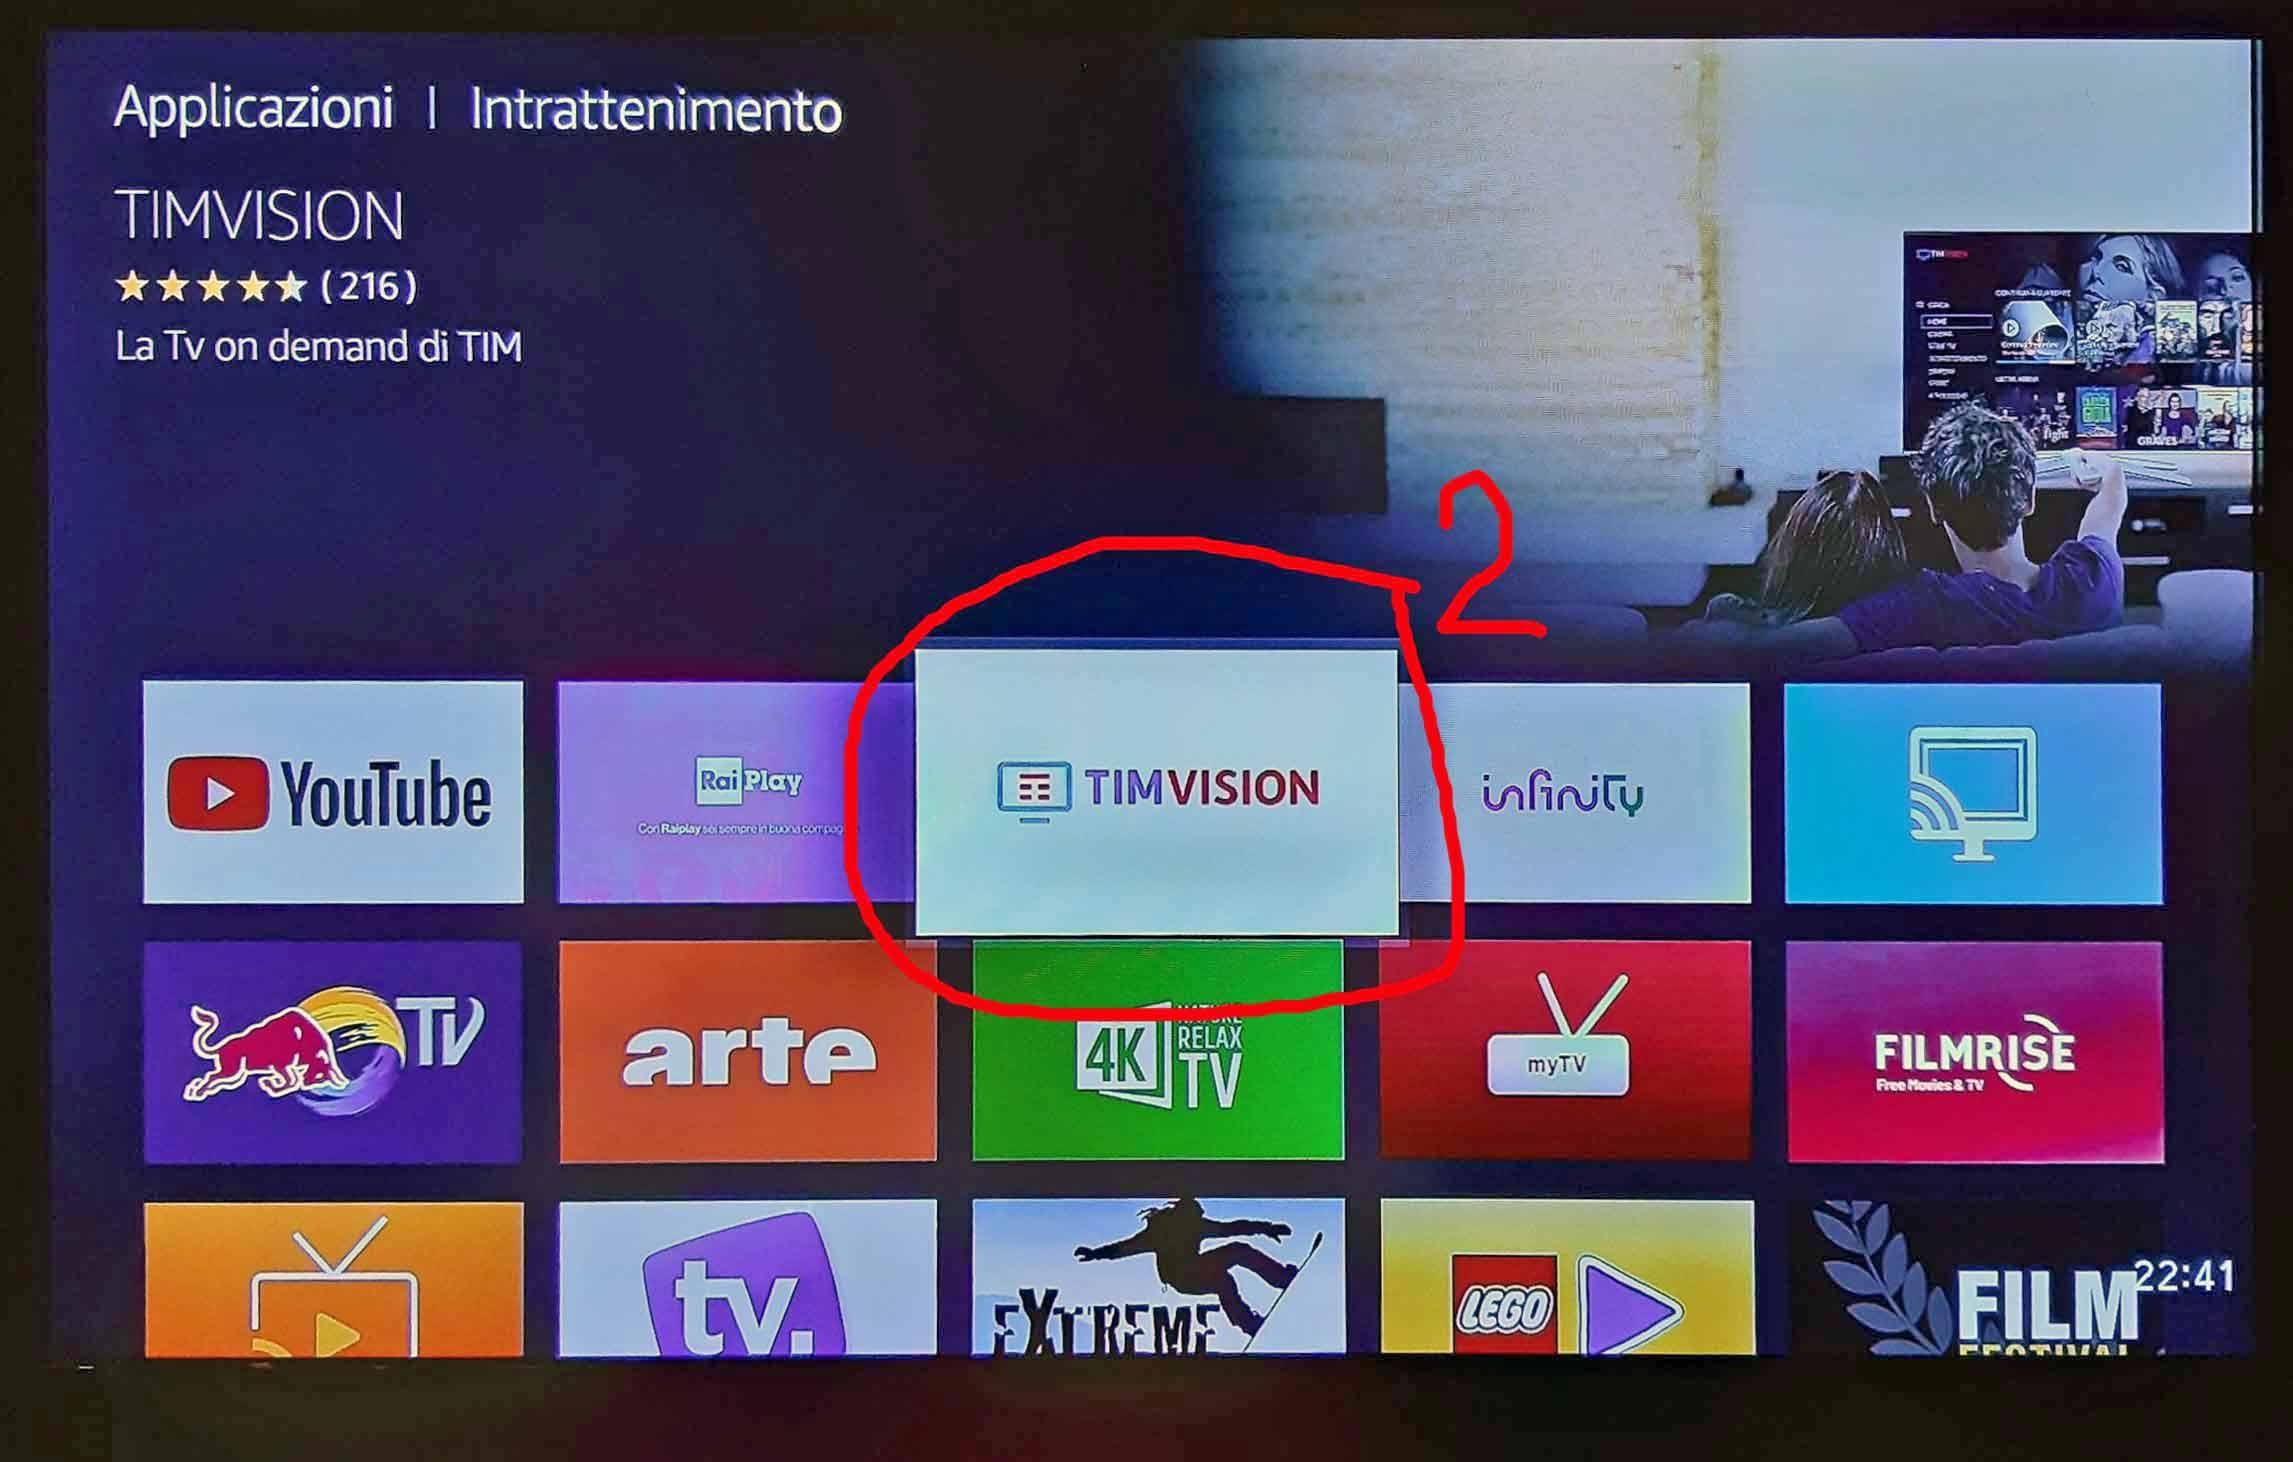 SCARICARE TIMVISION SU SMART TV PHILIPS